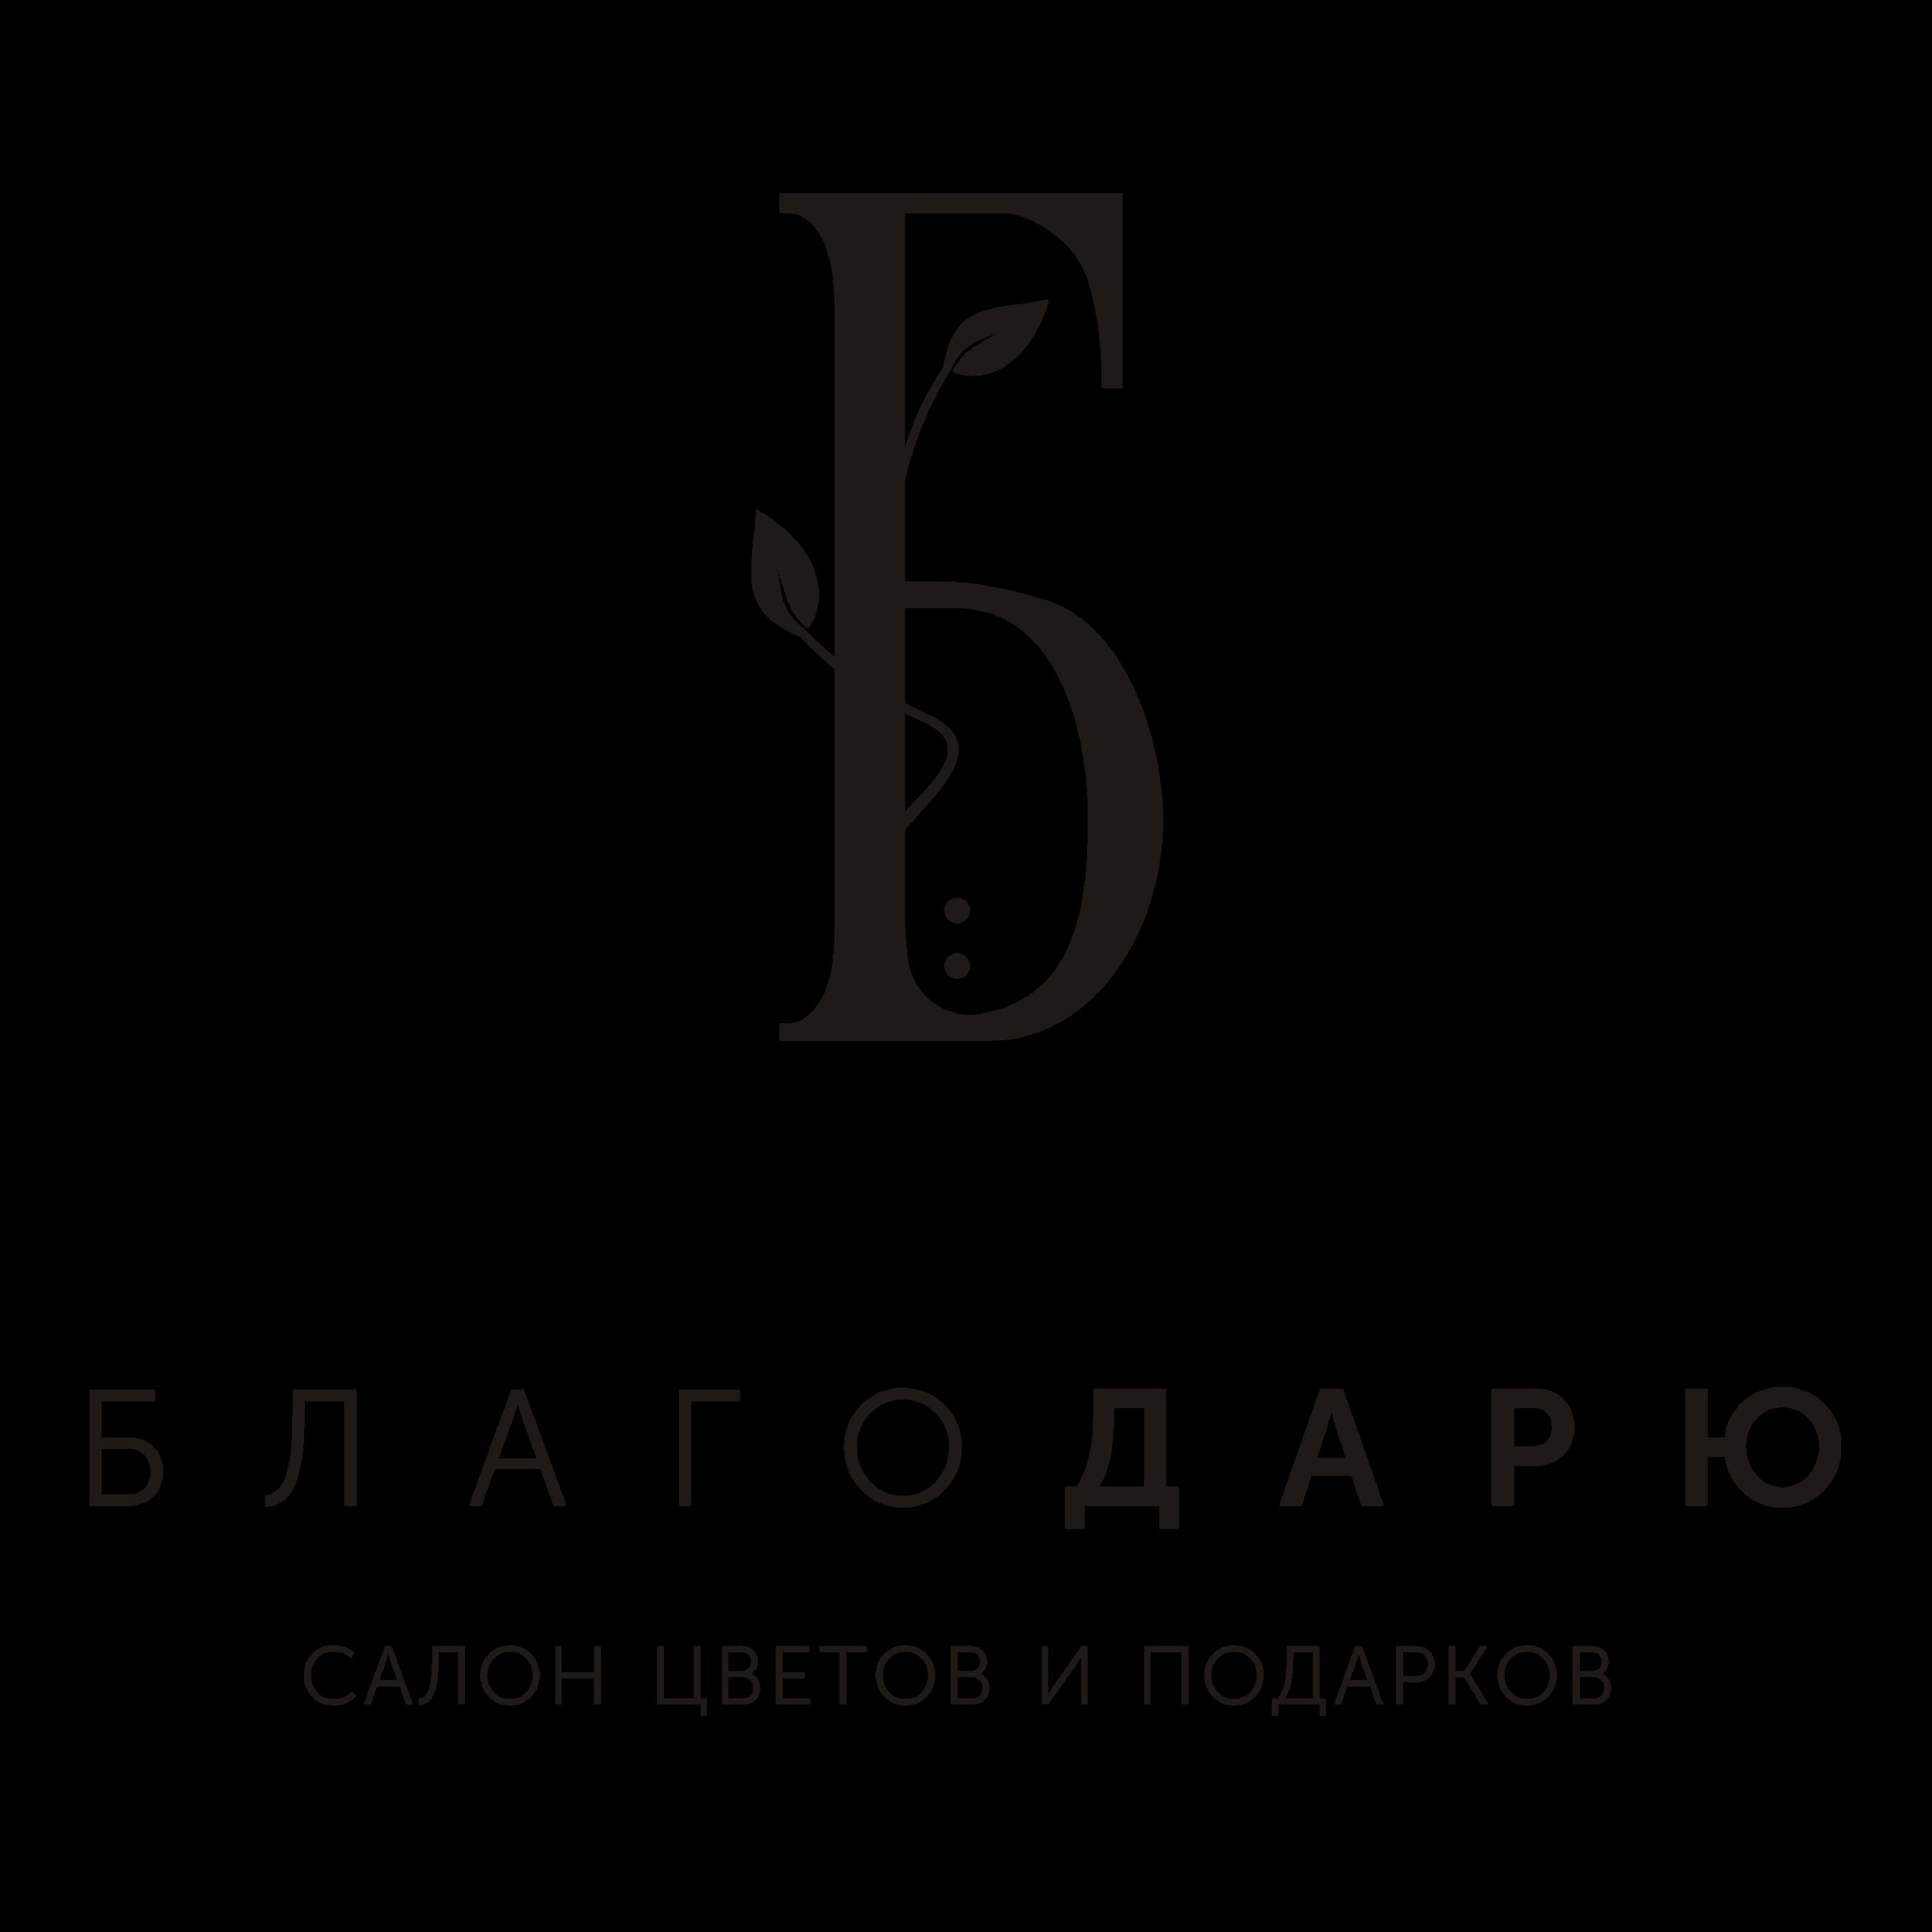 Логотип цветочного салона Благодарю